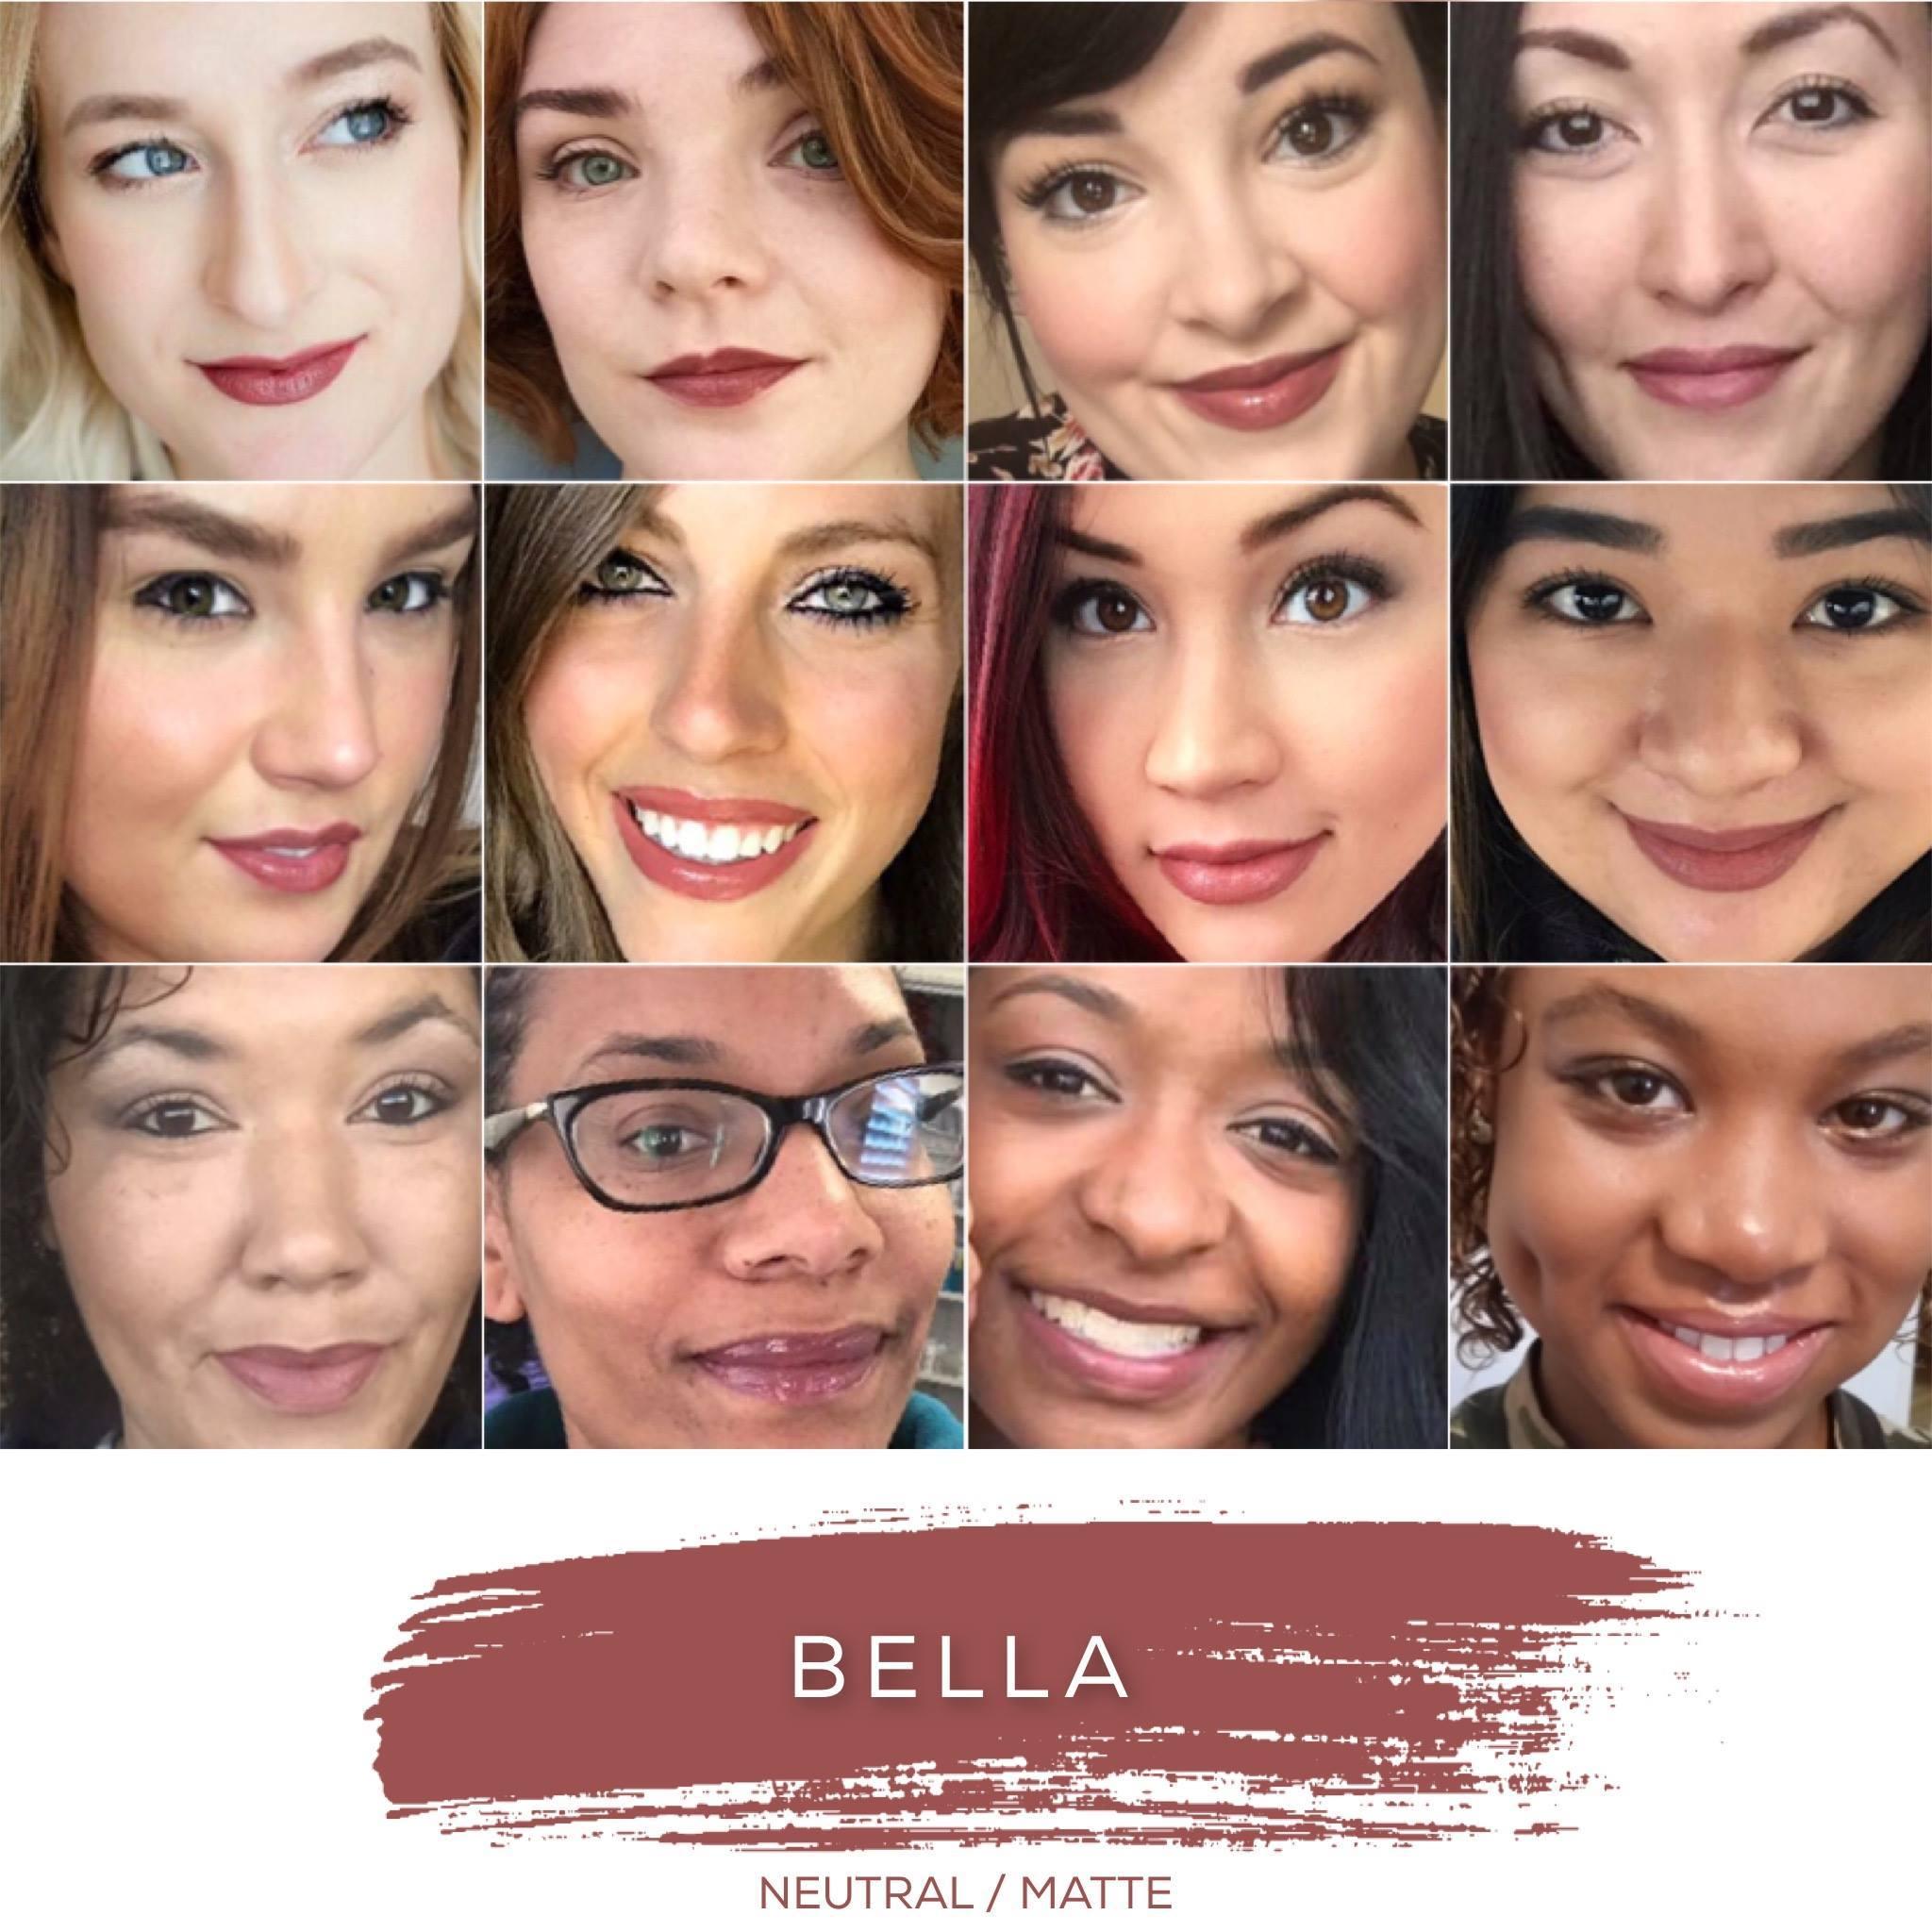 Bella collage